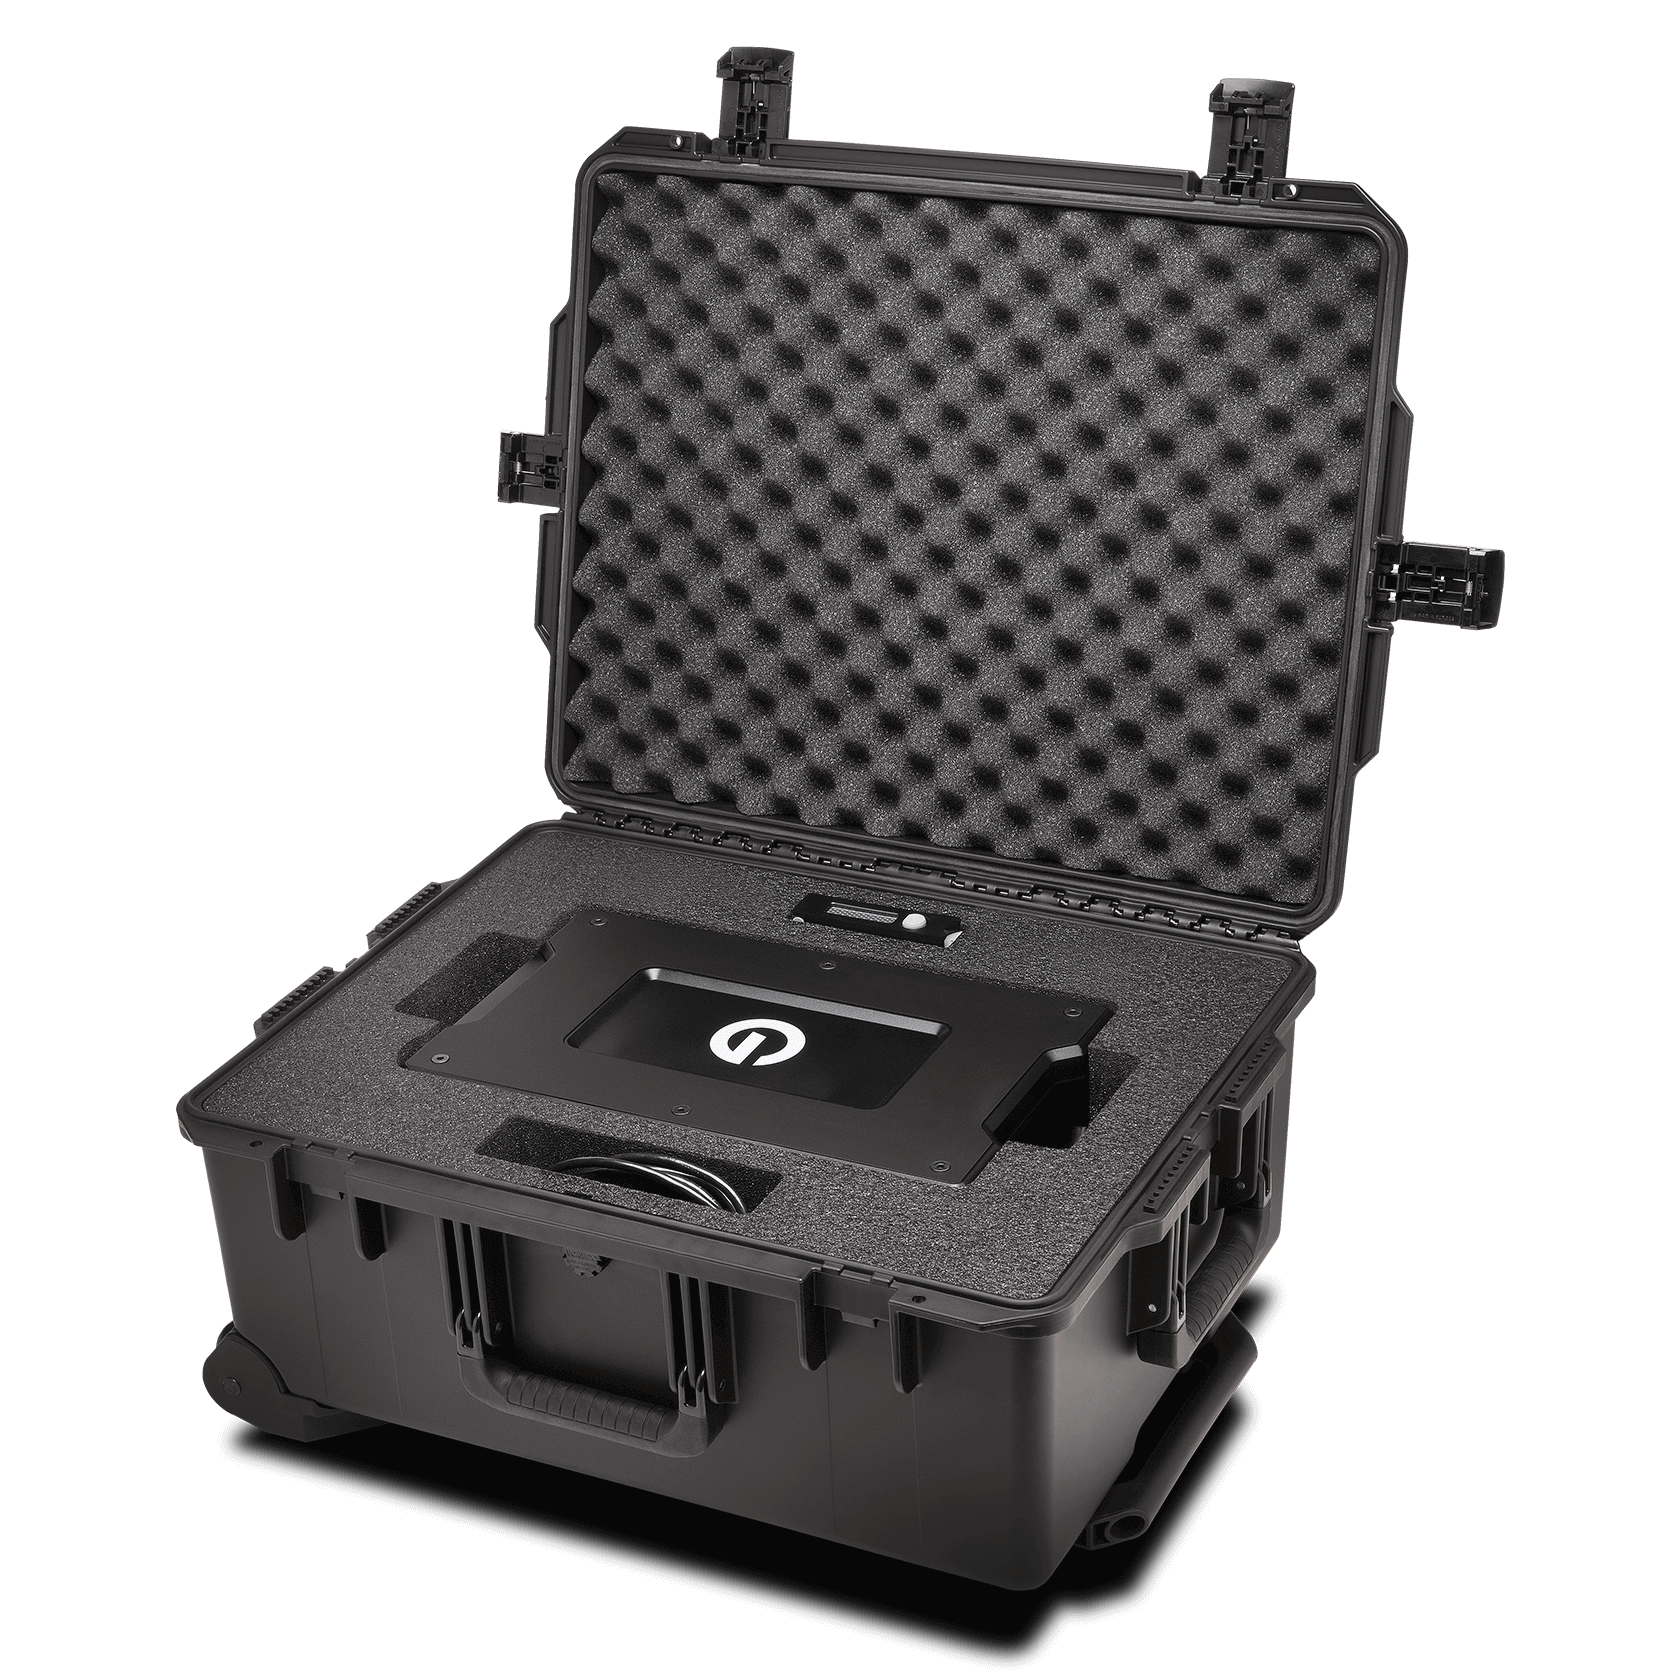 WesternDigital coupon: G-Technology Shuttle XL Case Peli IM2720 Spare module Foam, 8-bay Storage System - 0G04982-1